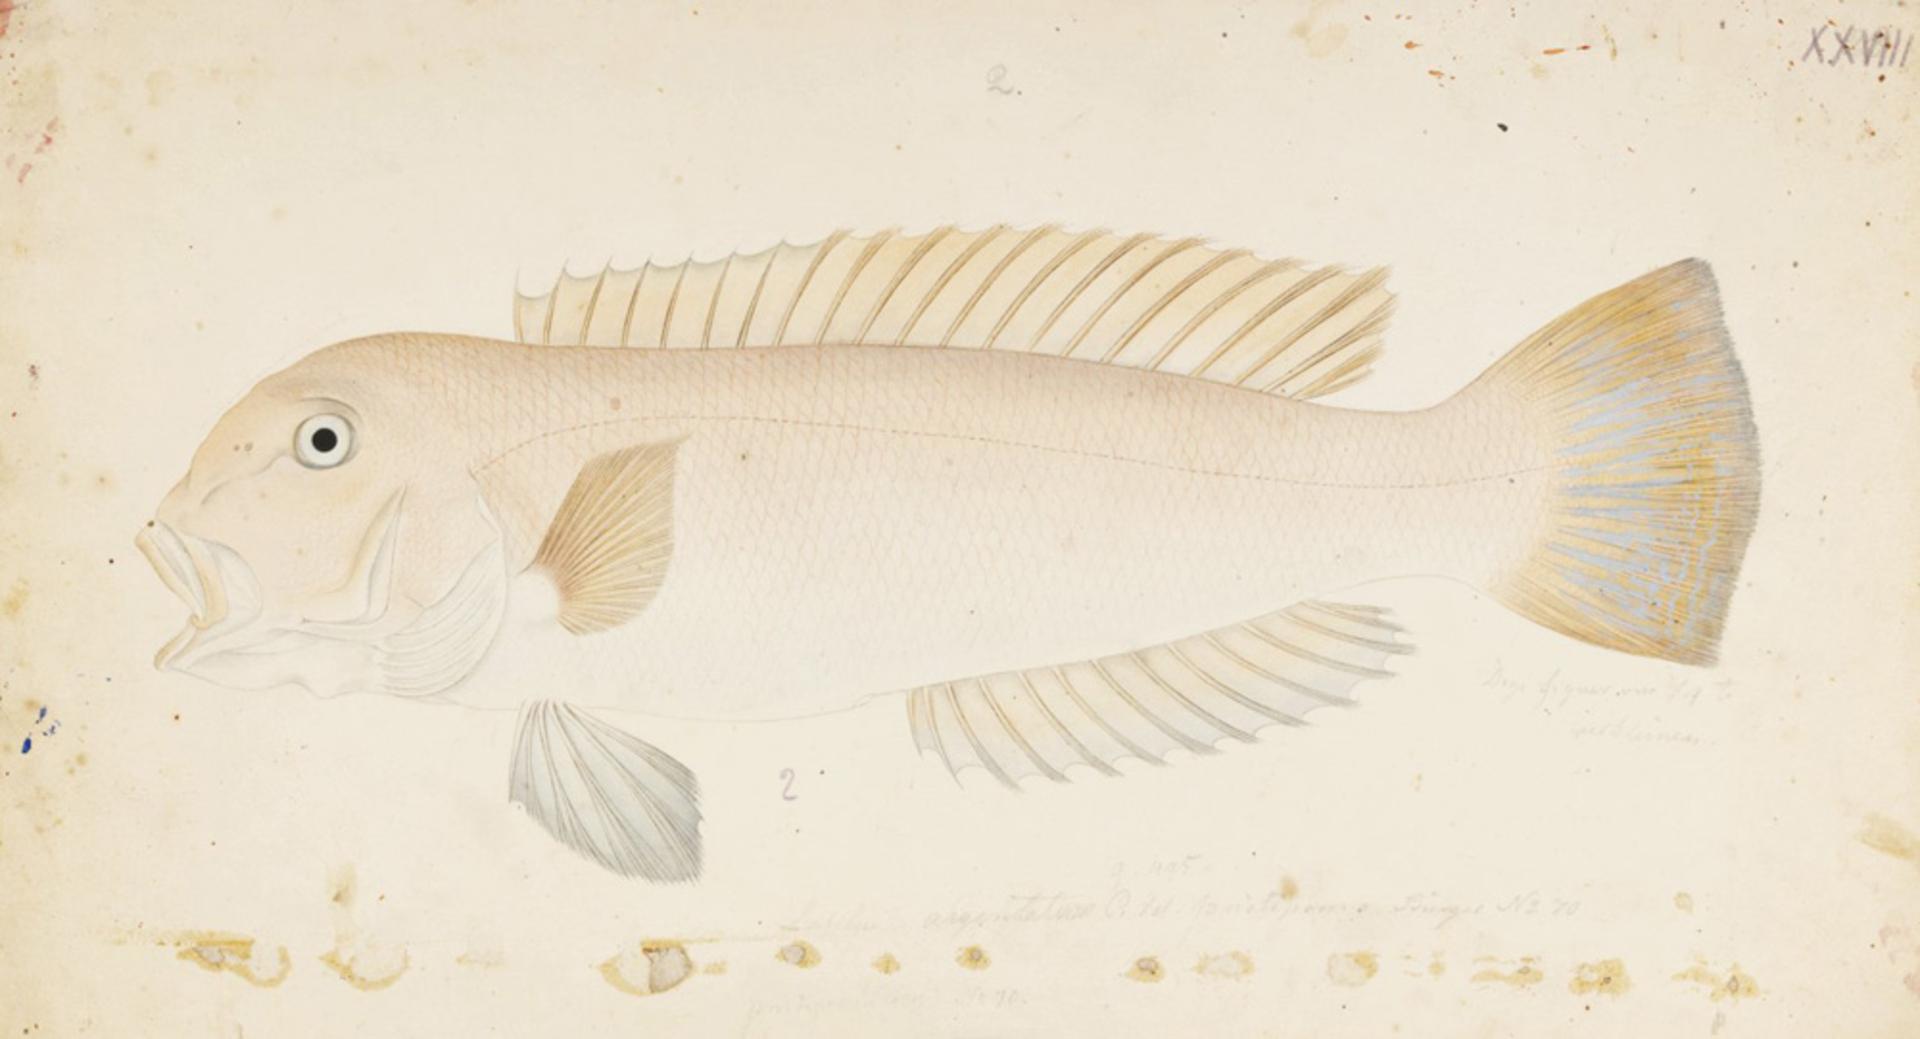 RMNH.ART.367 | Branchiostegus argentatus